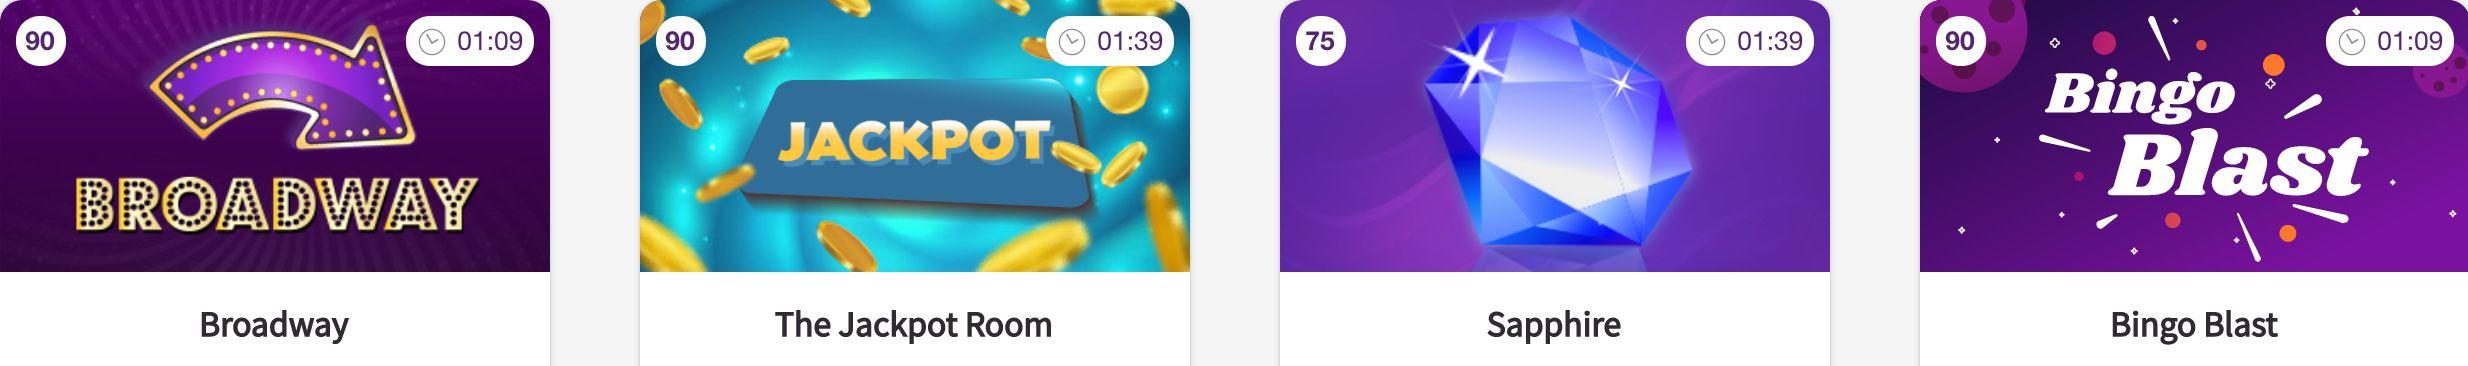 Butlers Bingo Bingo Games